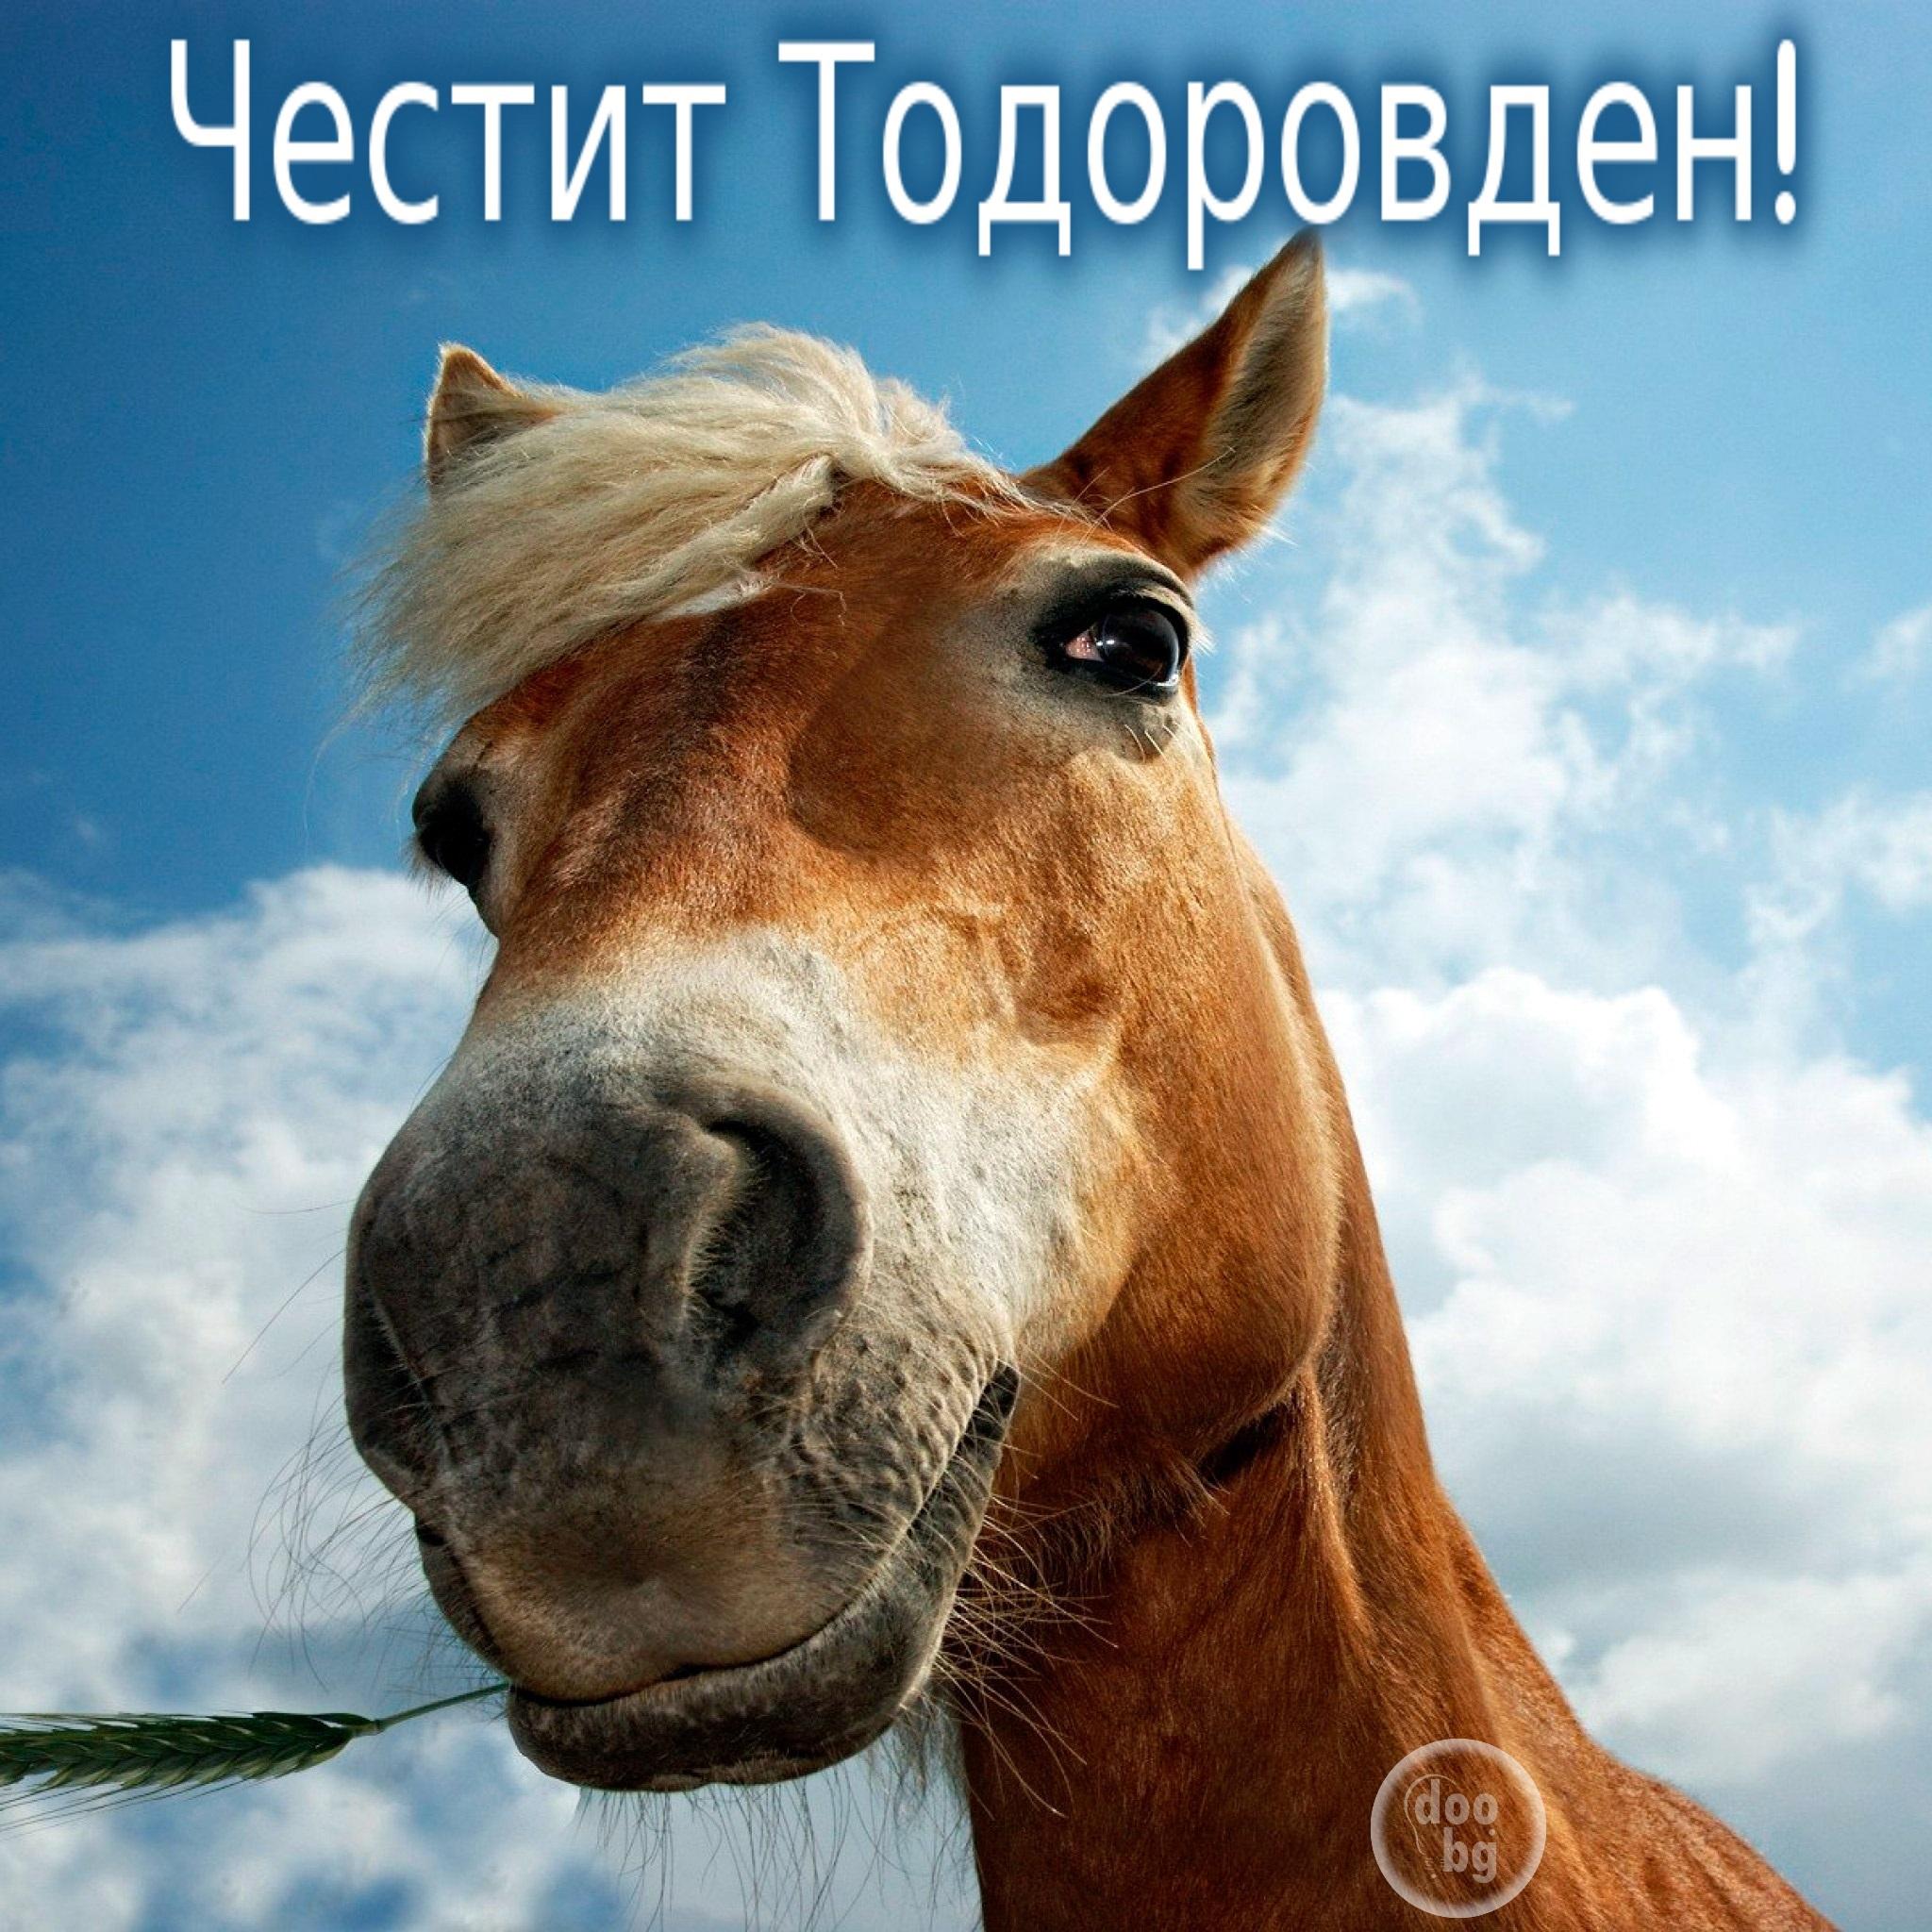 Весела картичка за Тодоровден